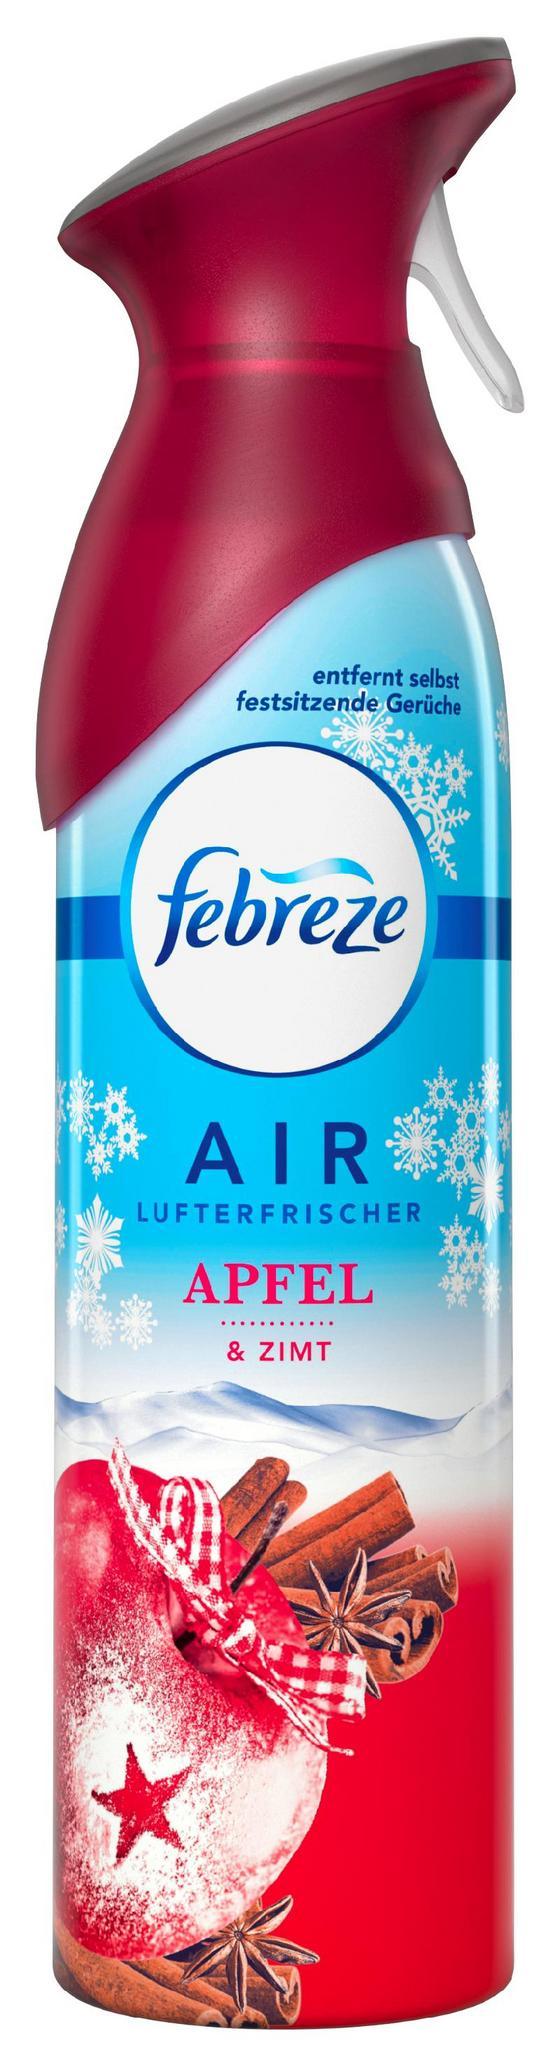 Lufterfrischer Febreze Apfel-zim - Basics (6,4/24,5/5,9cm)